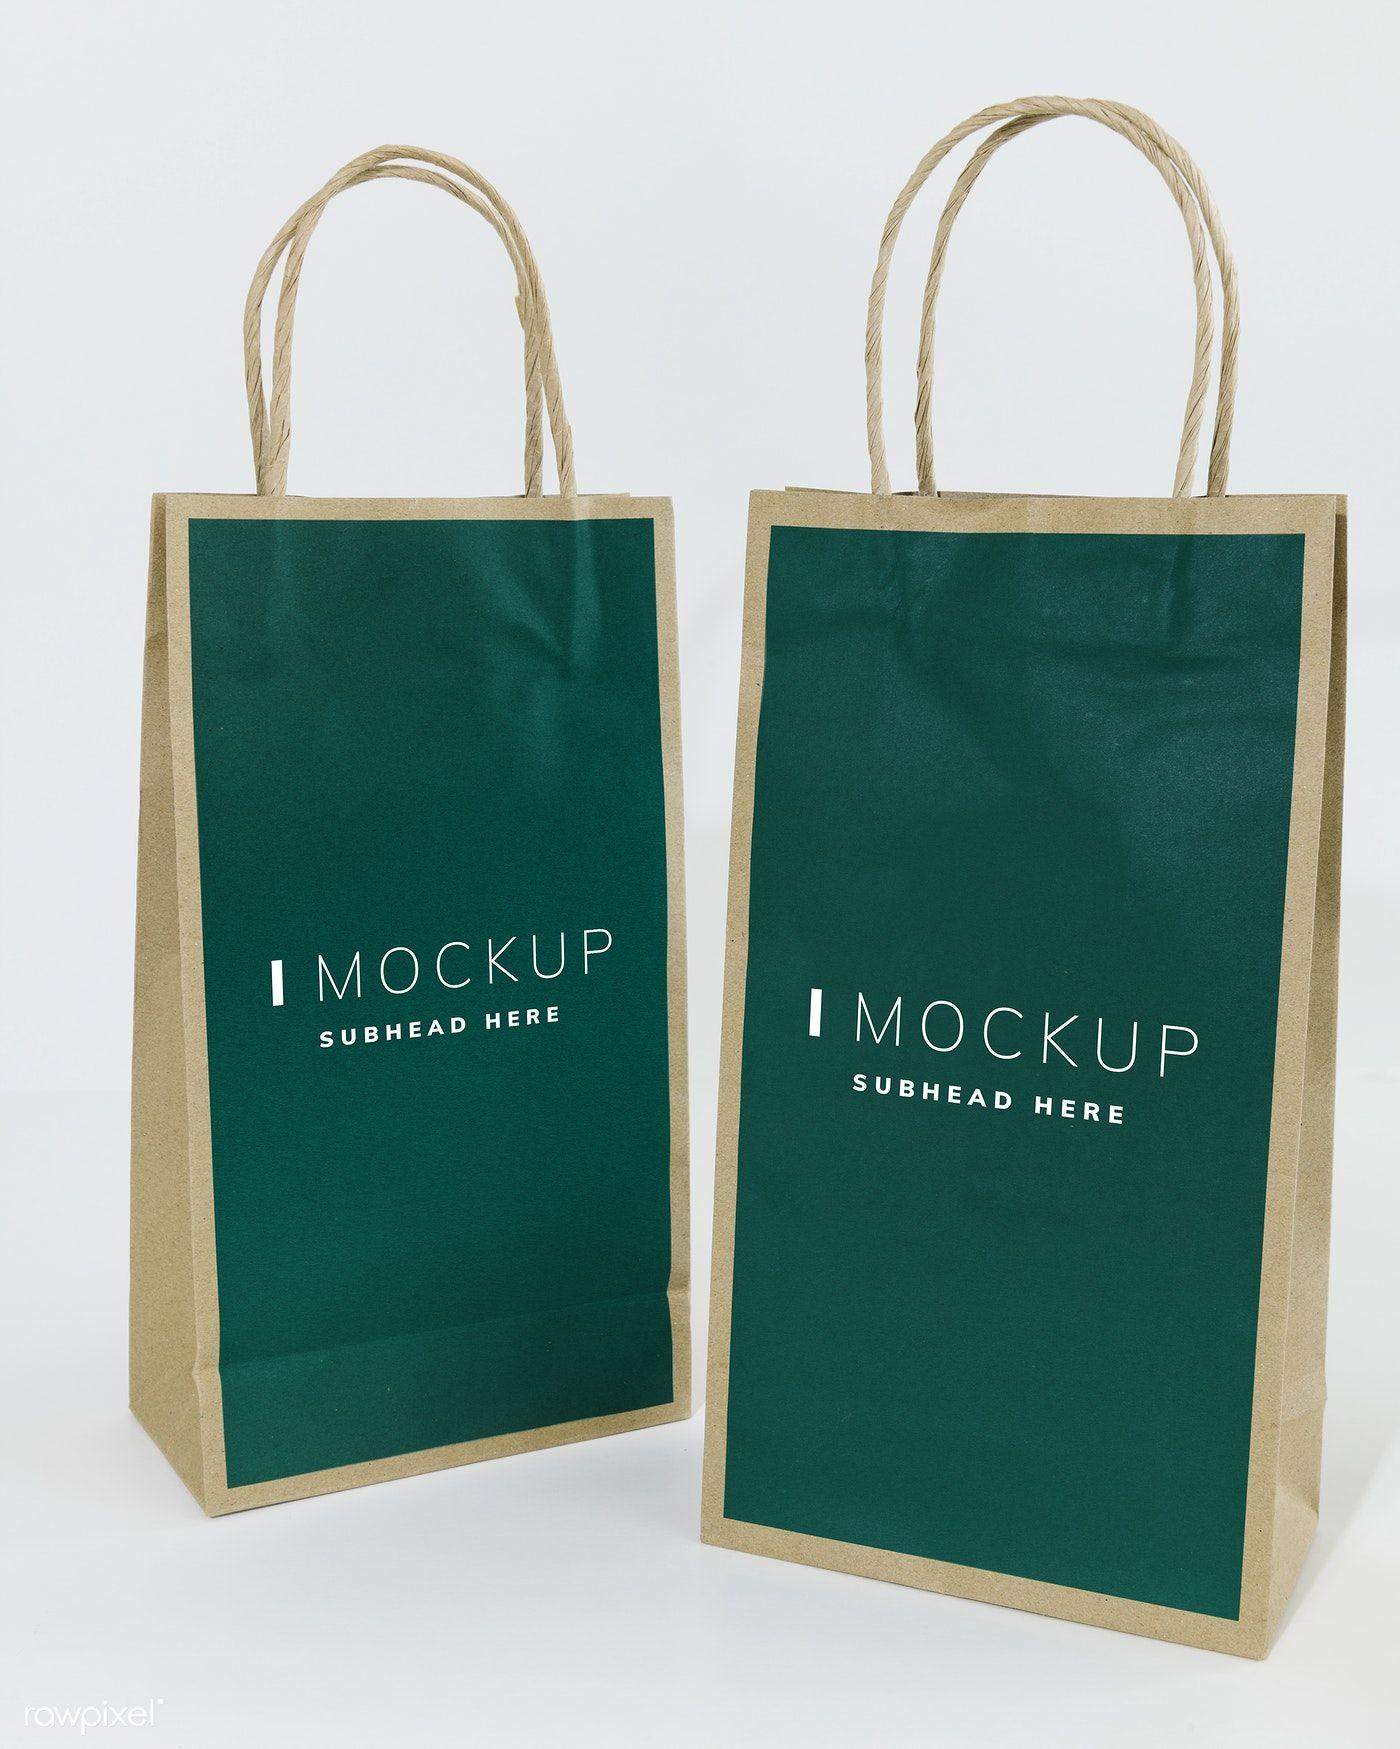 Download Two Green Paper Bag Mockups Free Image By Rawpixel Com Bag Mockup Paper Bag Green Paper